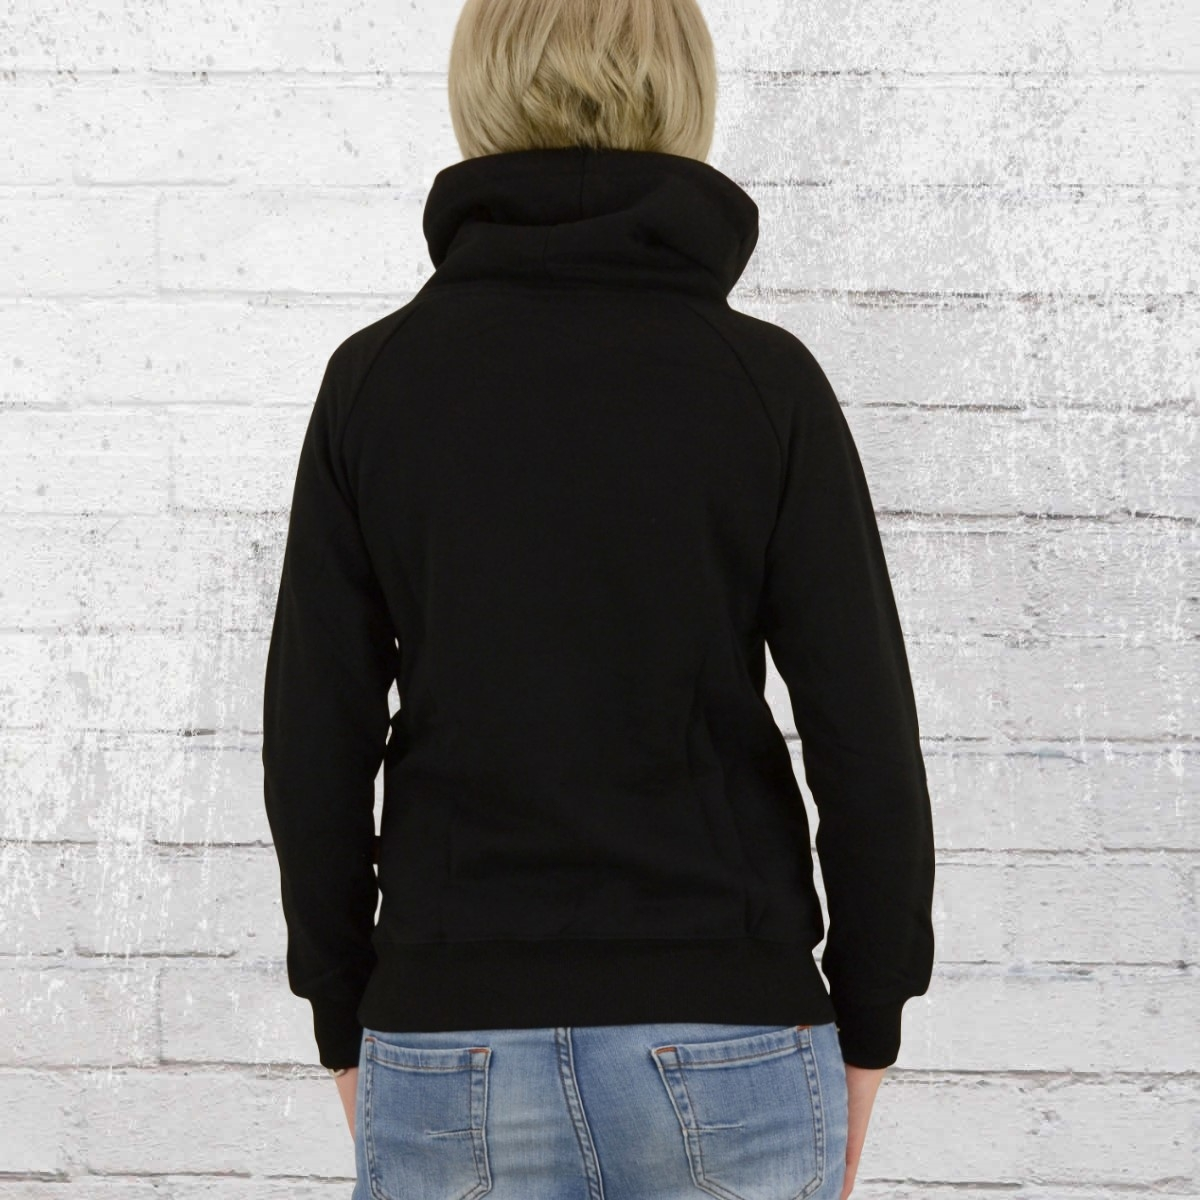 London Ladies Order Place NowLonsdale Sweater Pitch Black oCBedrWEQx